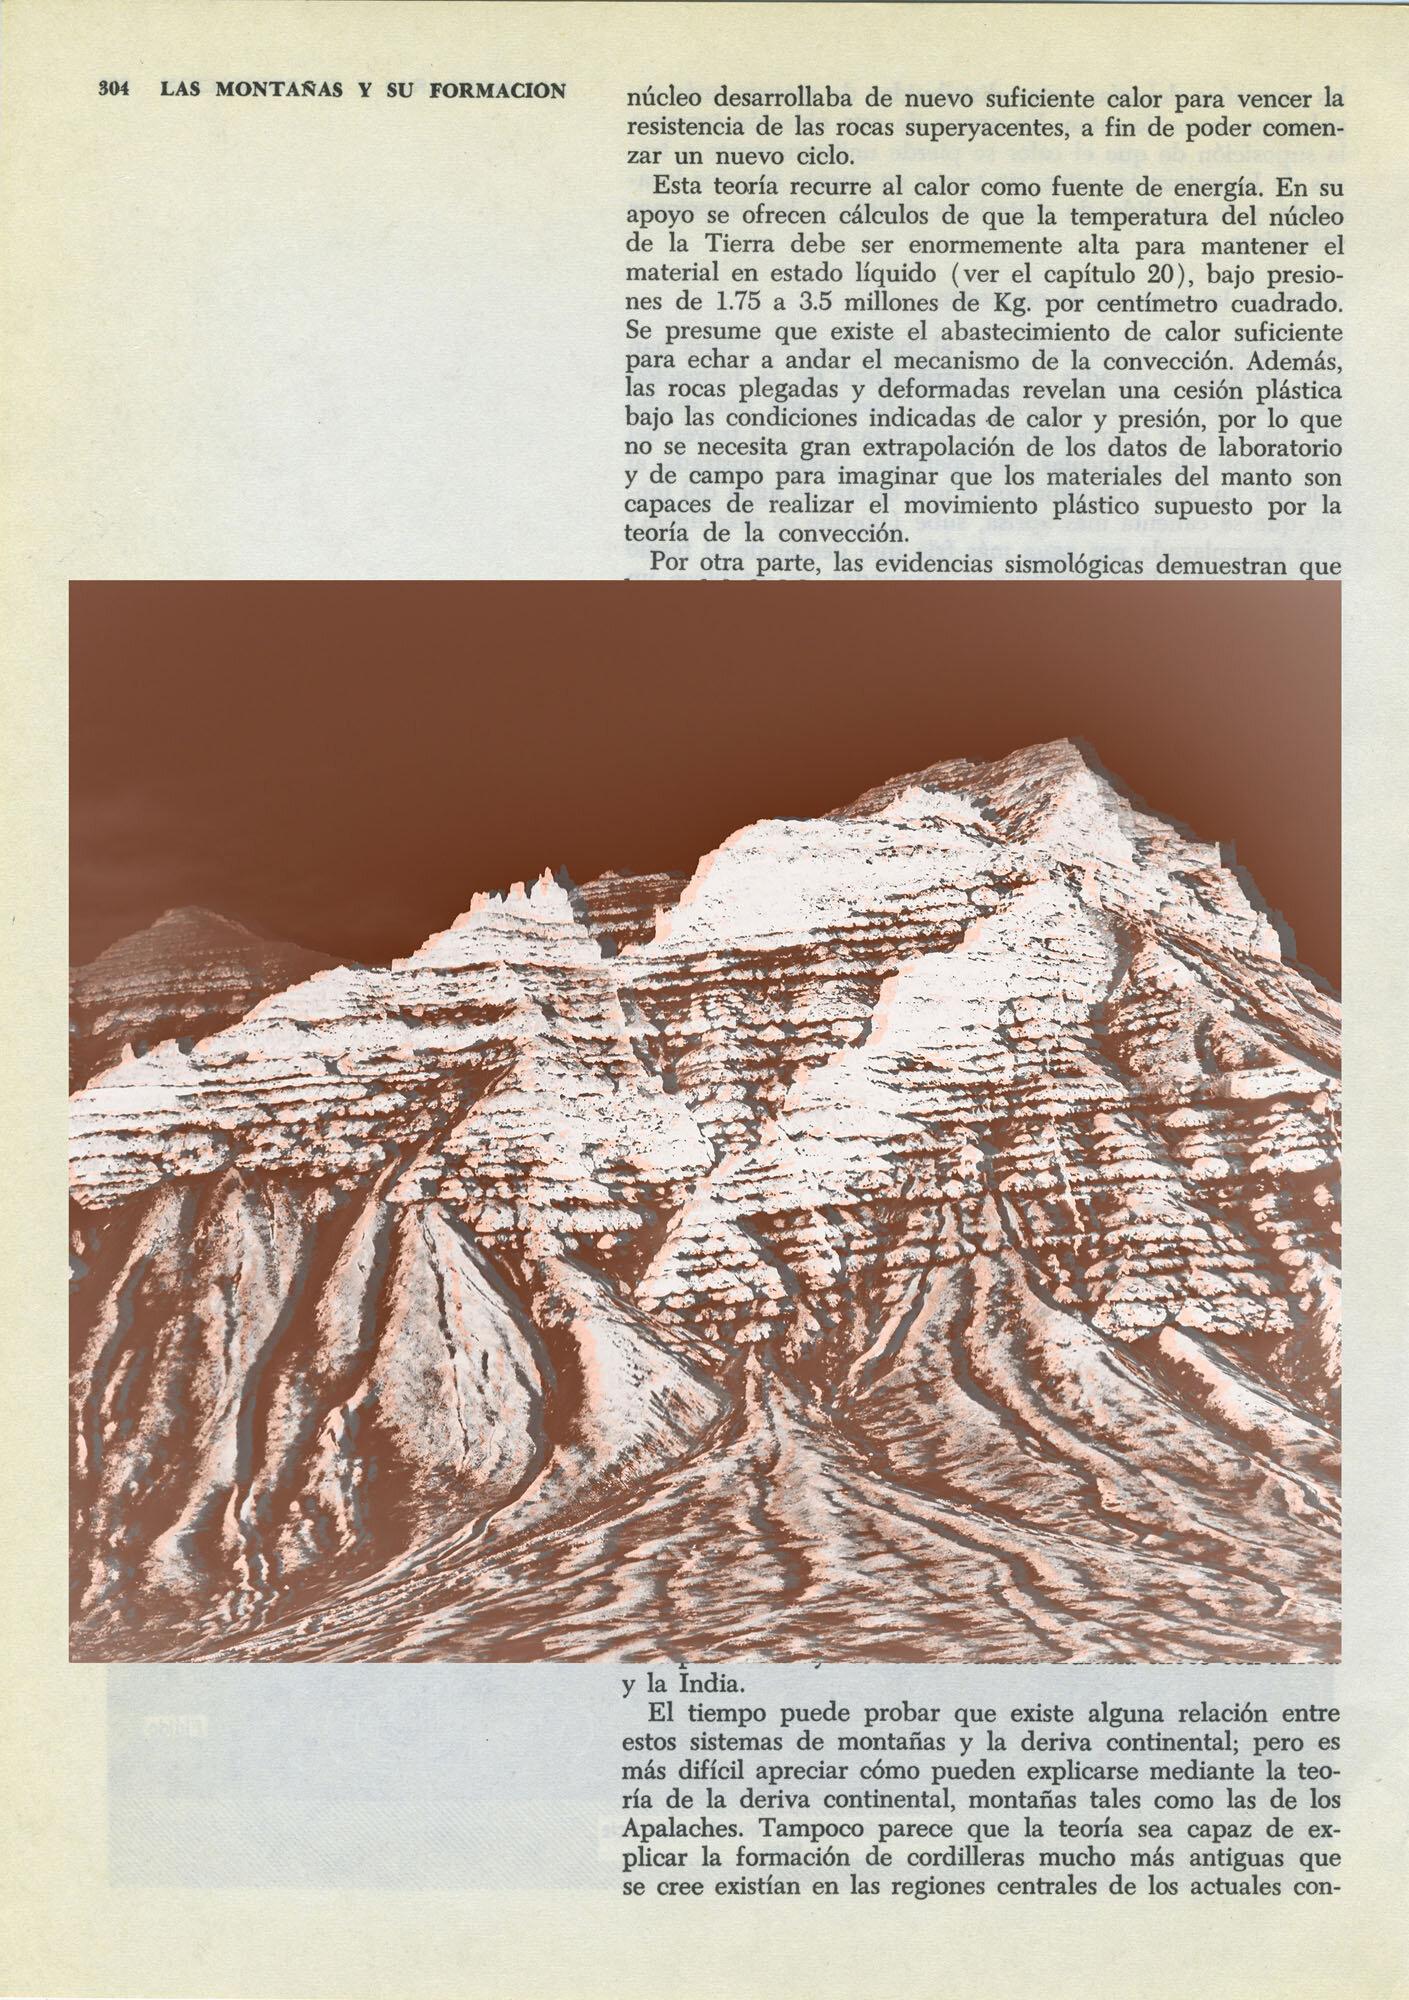 190205 NoA MountainFormation 8.jpg